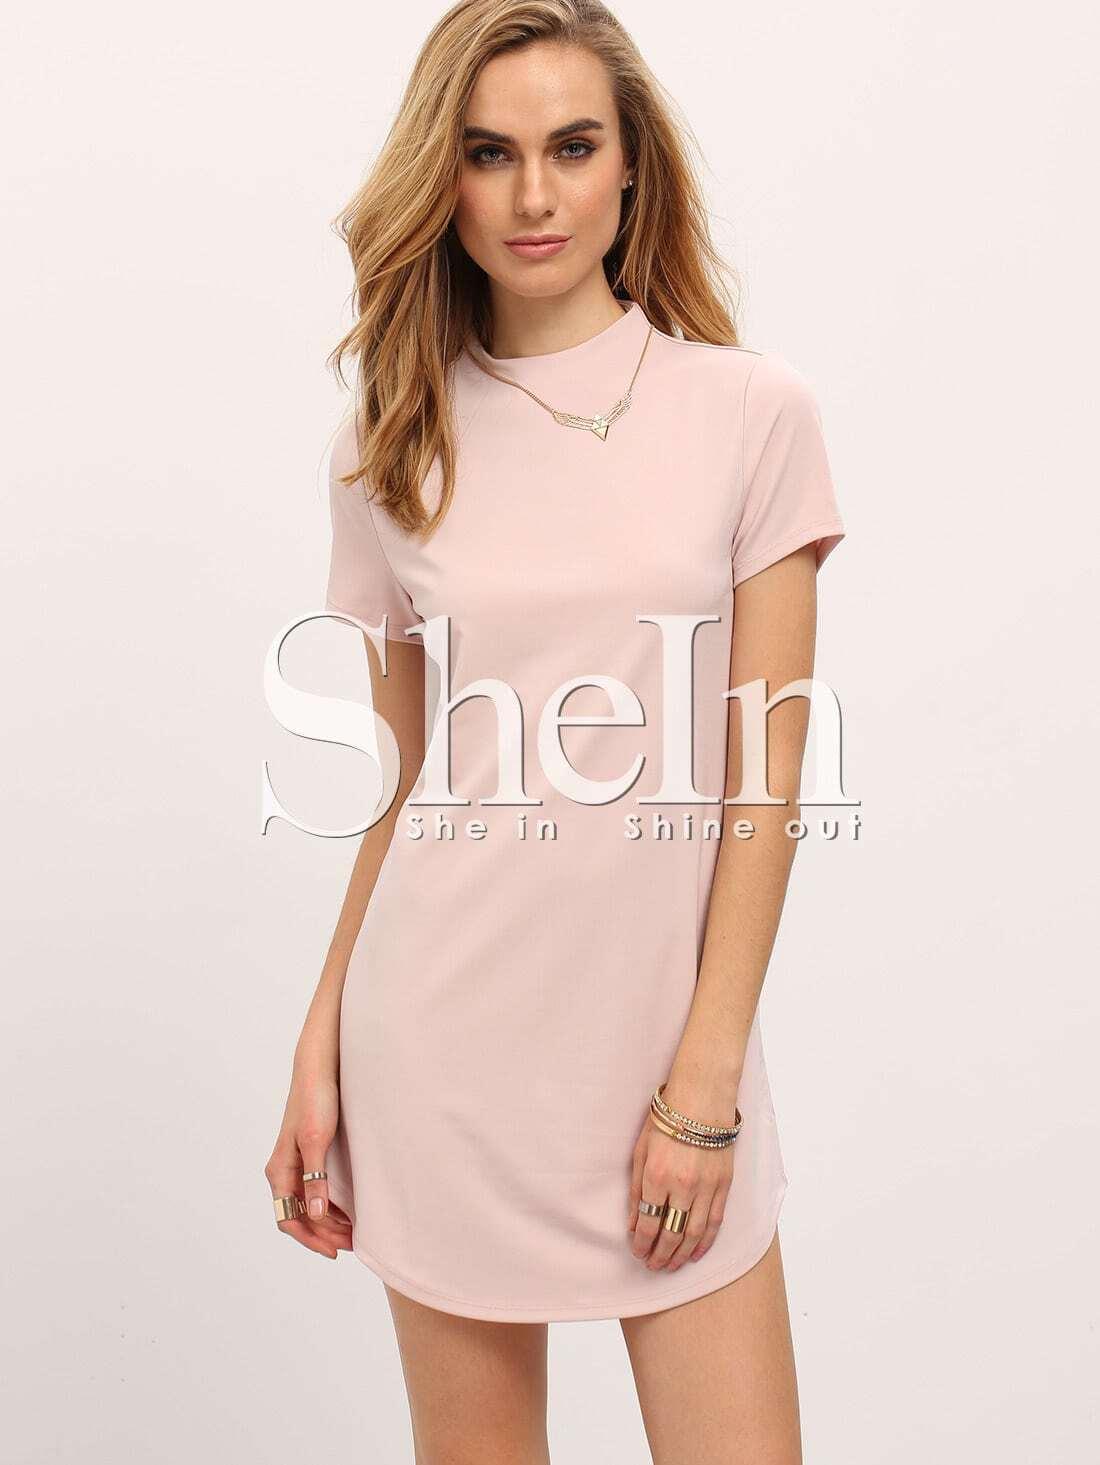 Vestido recto cuello alto manga corta -rosado claro-Spanish SheIn ...